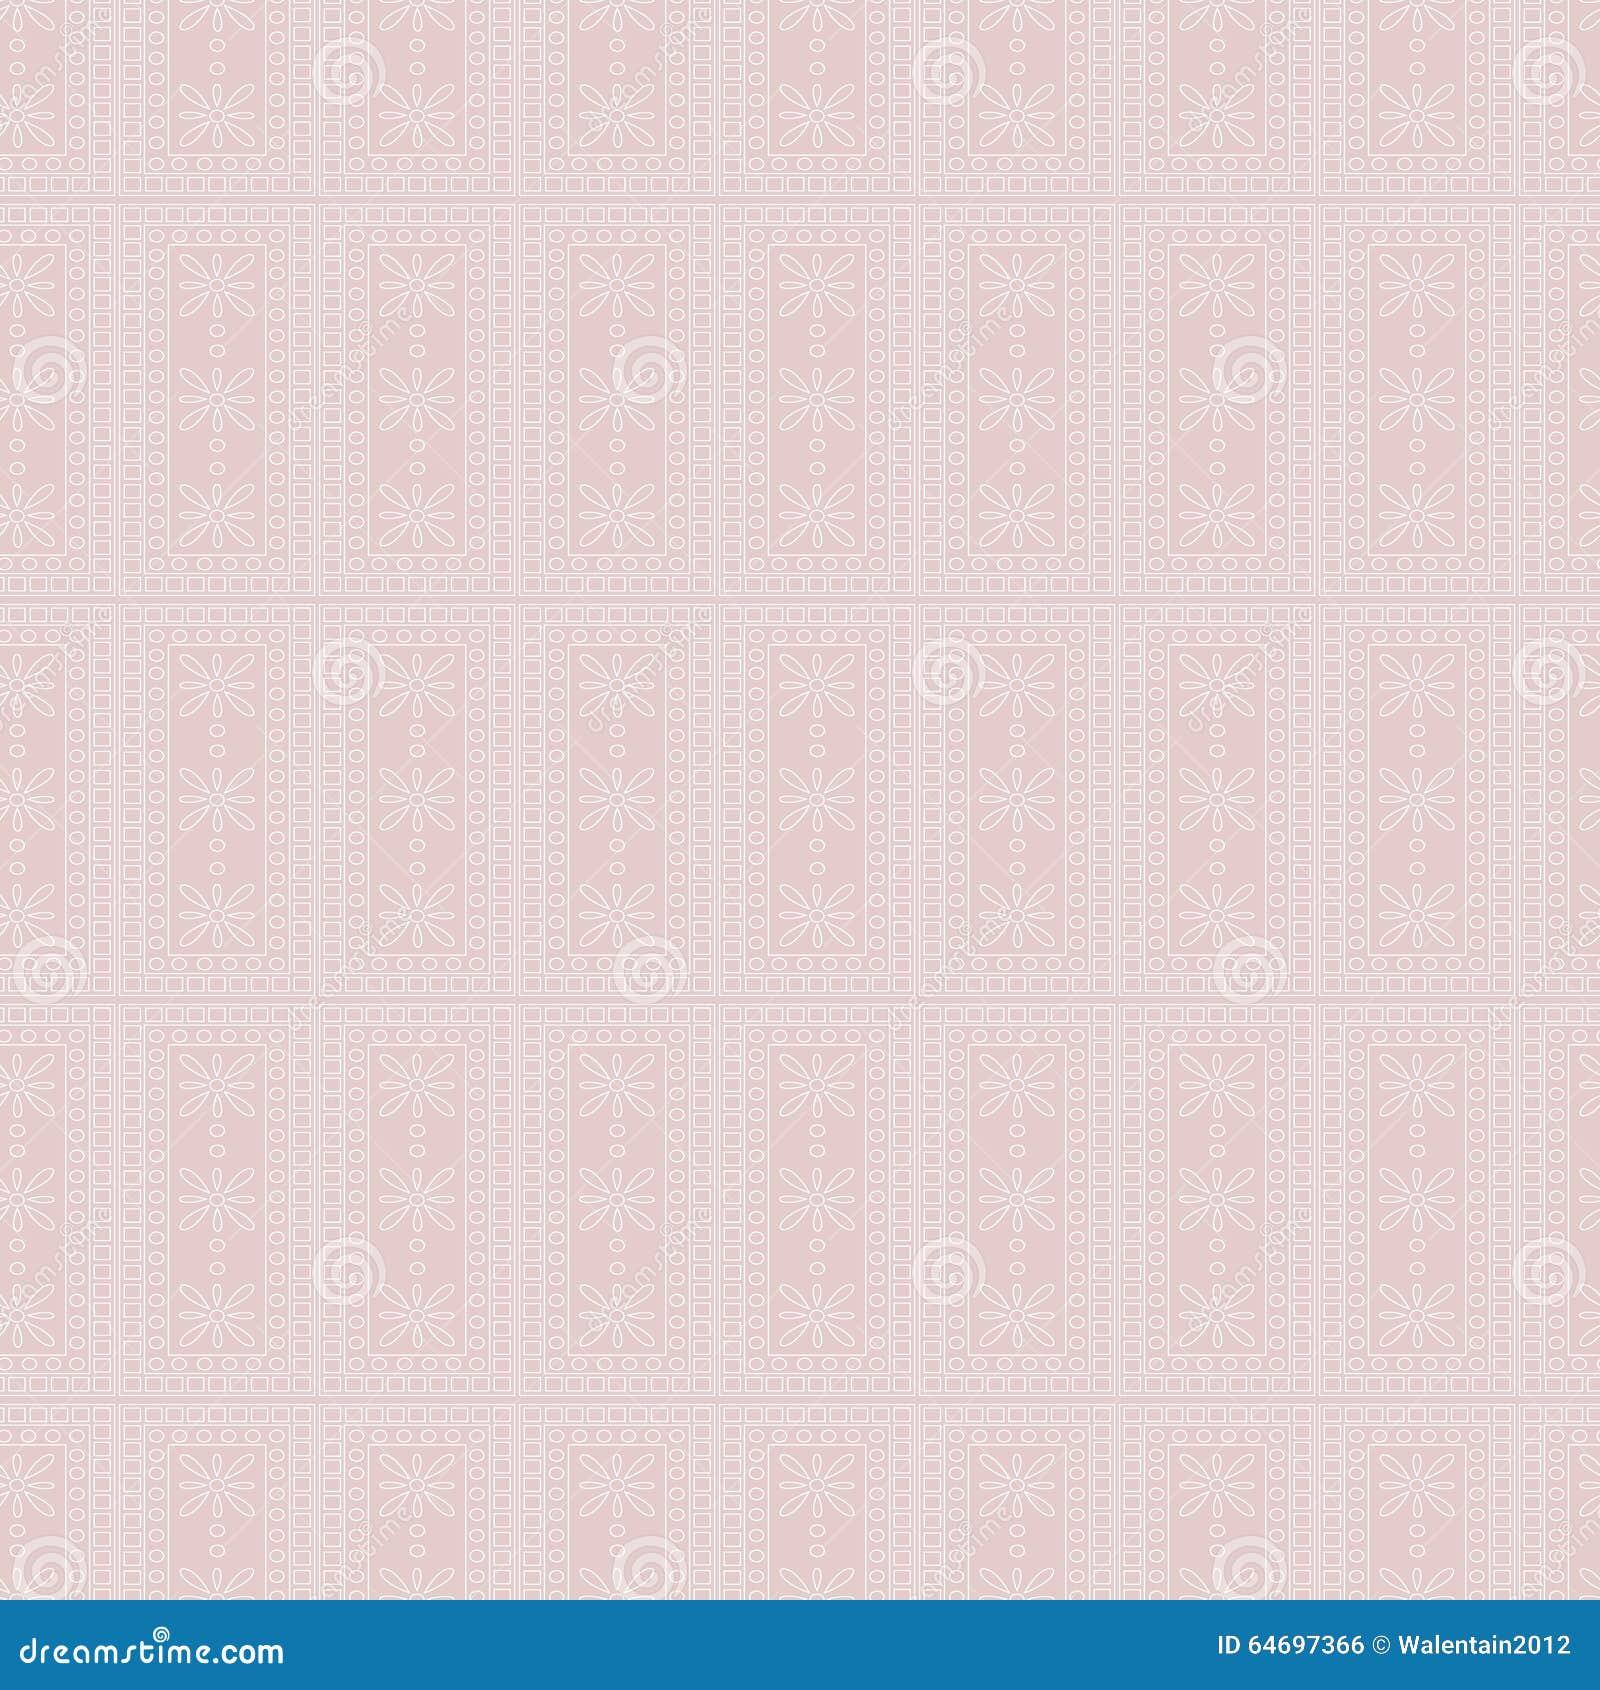 Seamless vektor för modell Symmetrisk geometrisk bakgrund med rektanglar på den rosa bakgrunden dekorativ prydnad